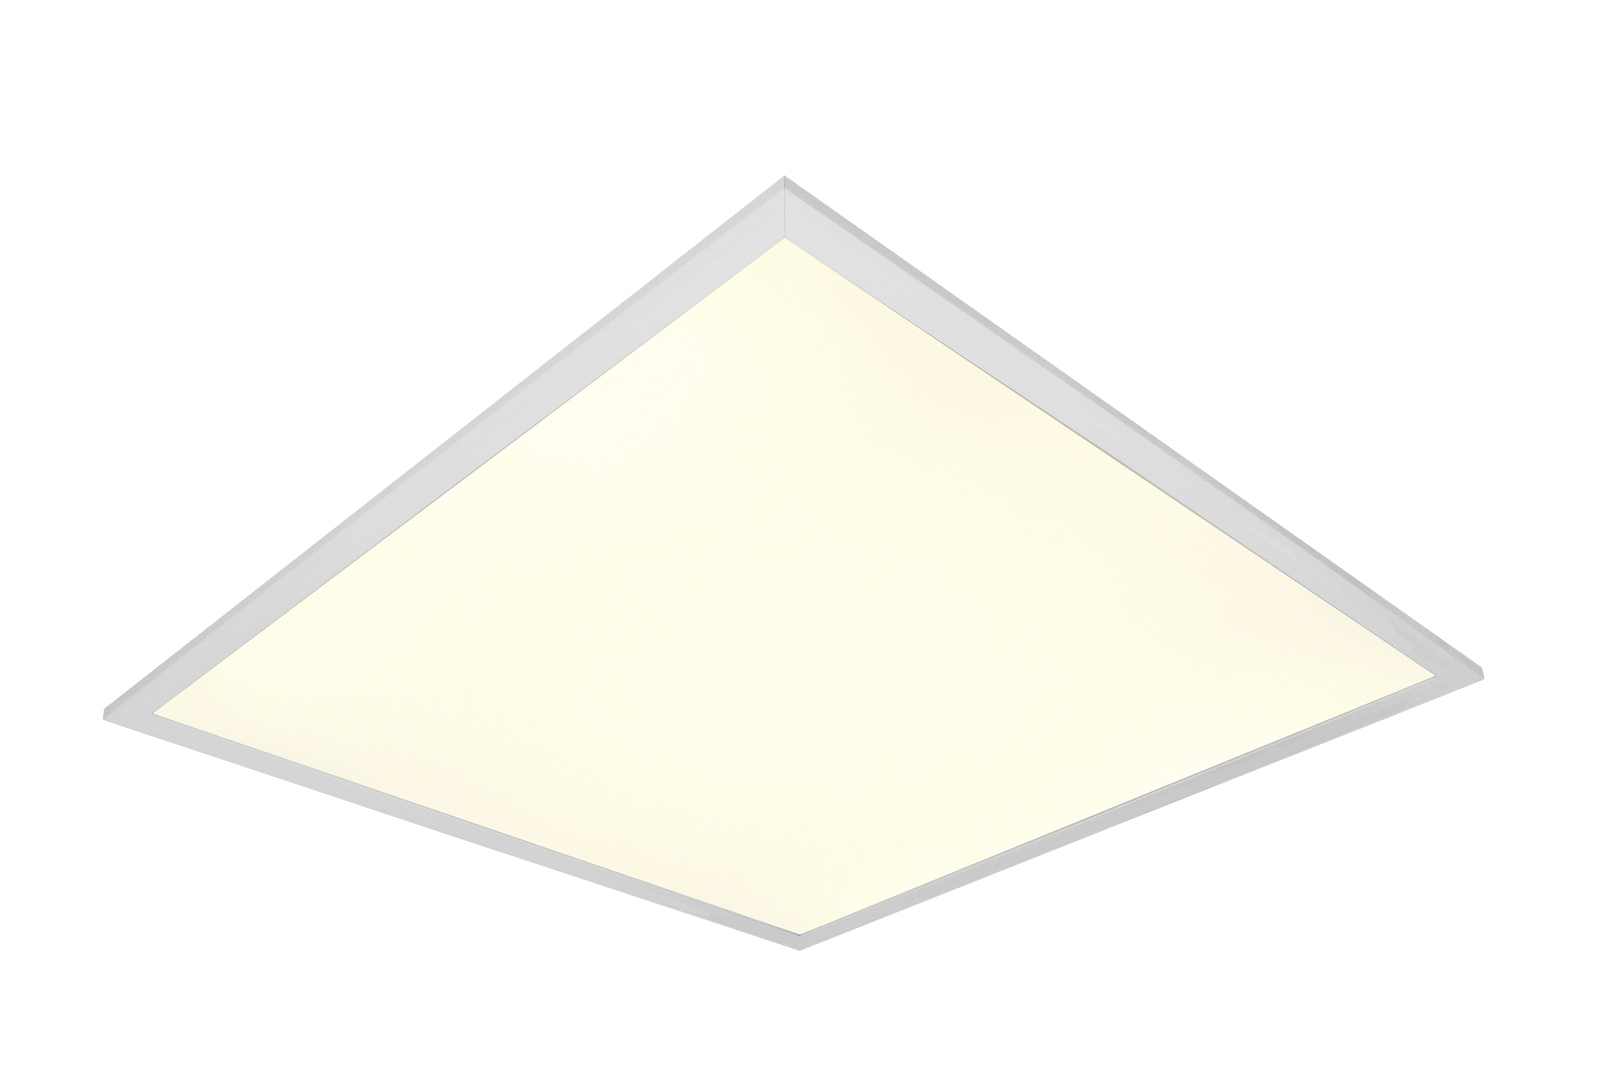 Panou LED pătrat alb 60W 230V IP20 4000K